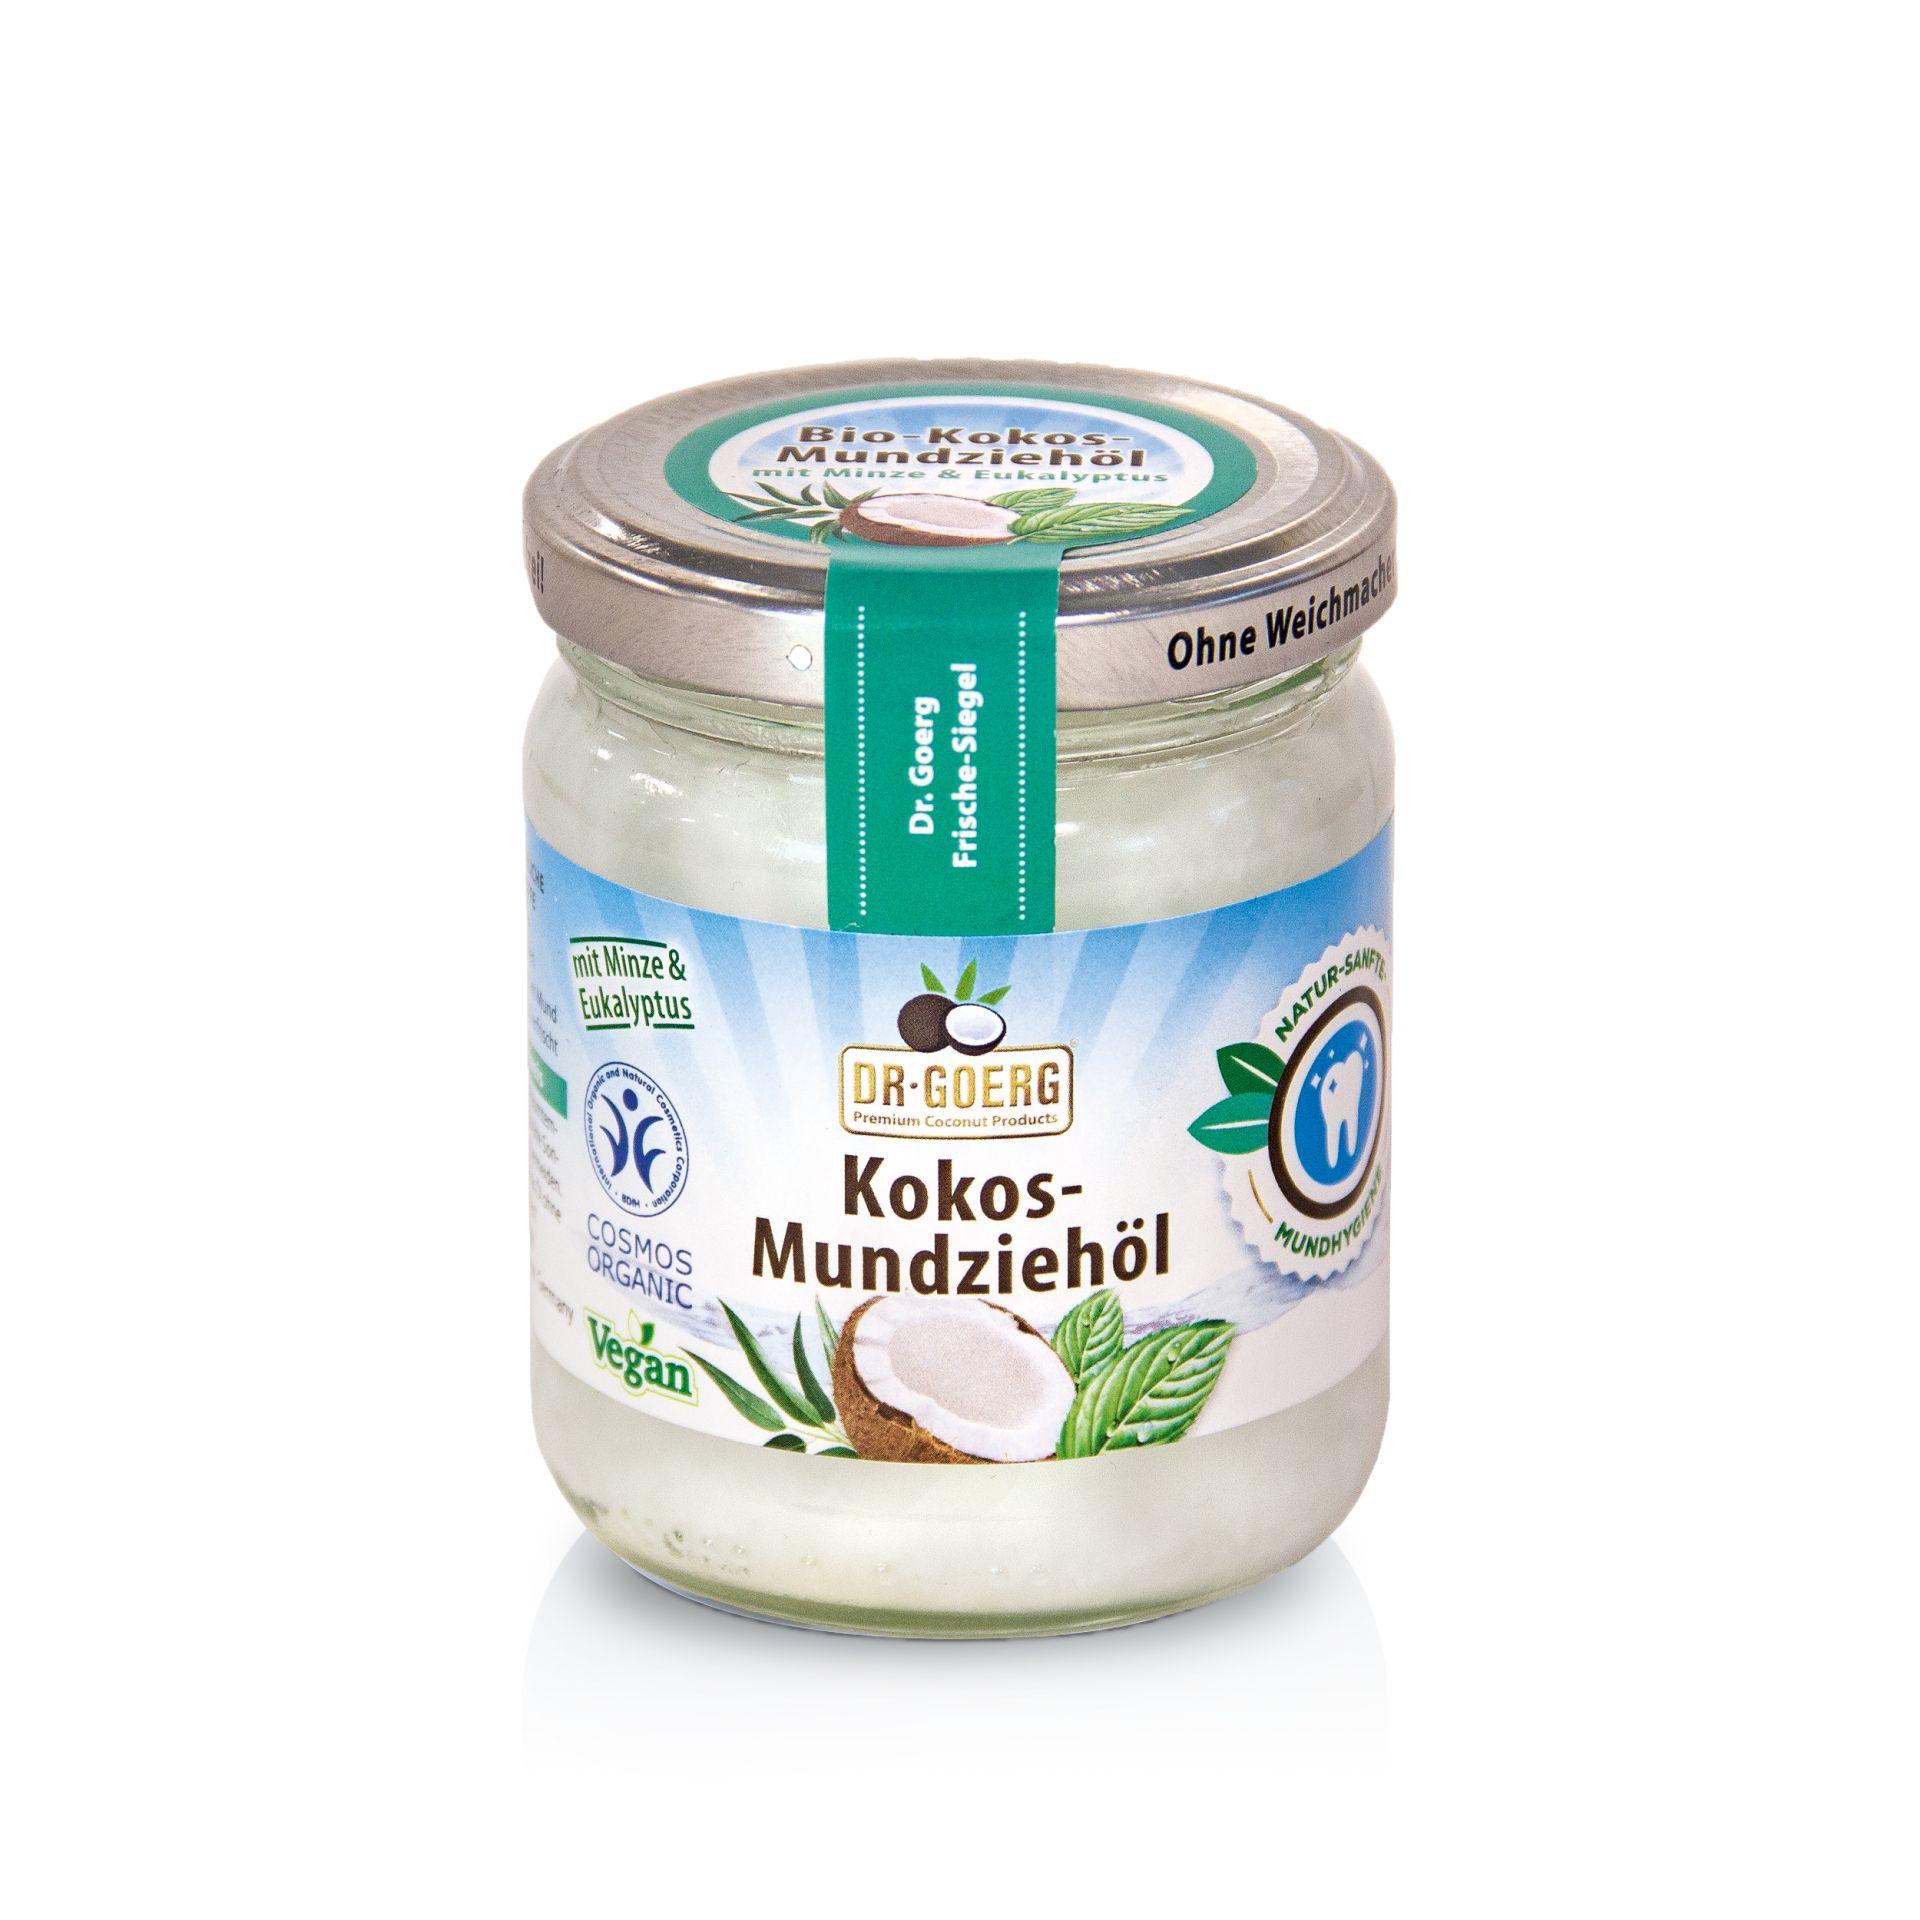 Dr Goerg Premium Bio-Kokos-Mundziehoel